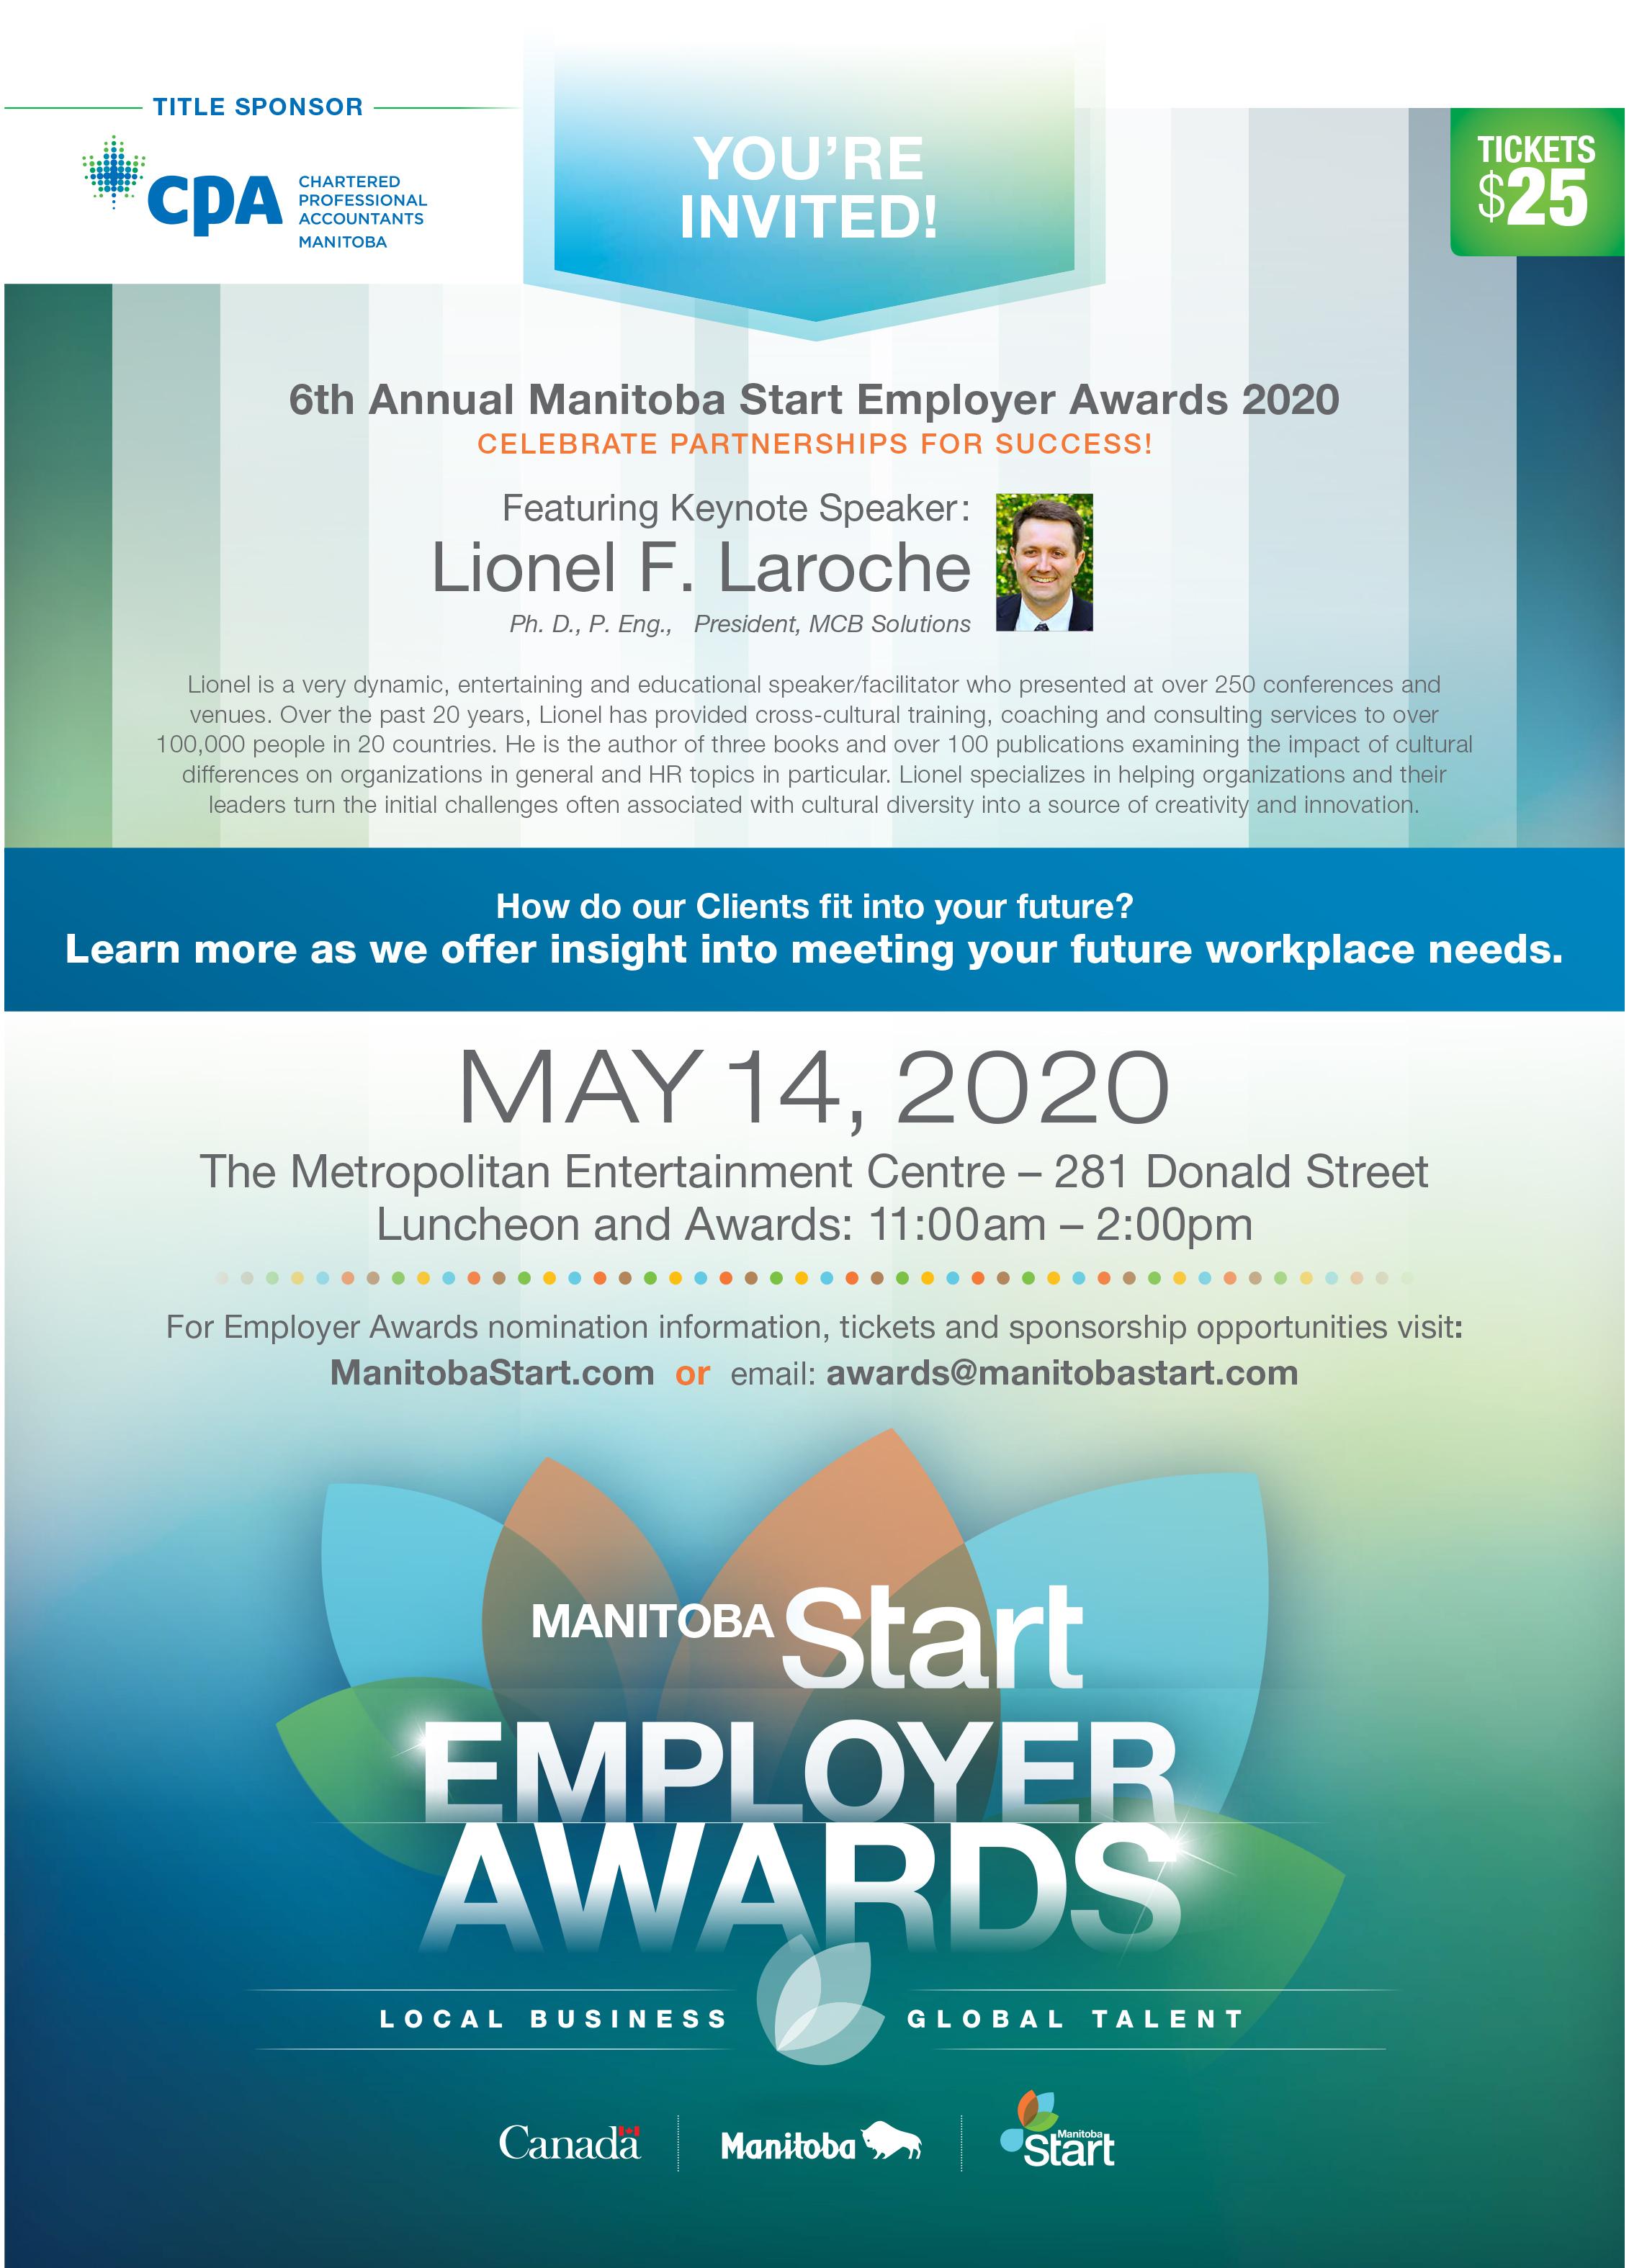 2020 Employer Awards Invitation